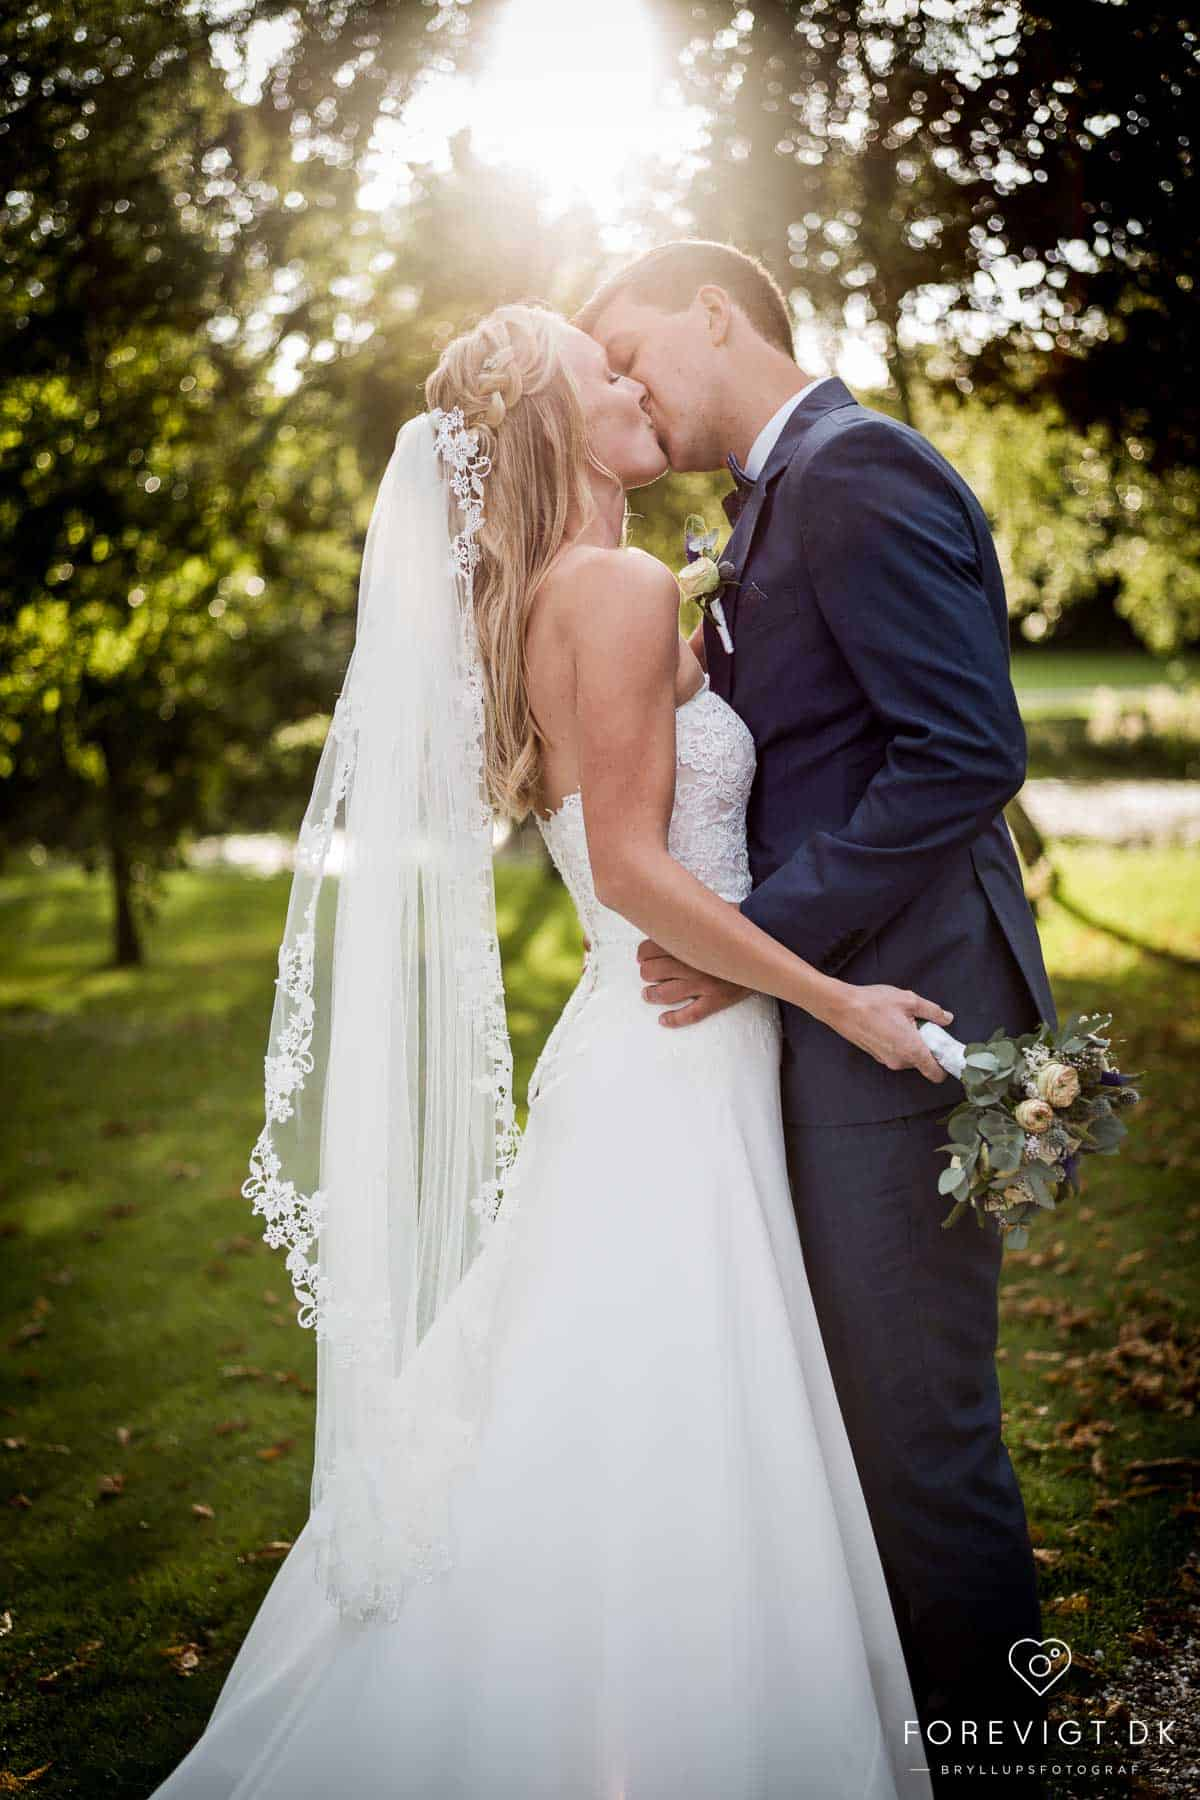 Bryllupsfotografer Bjerringbro